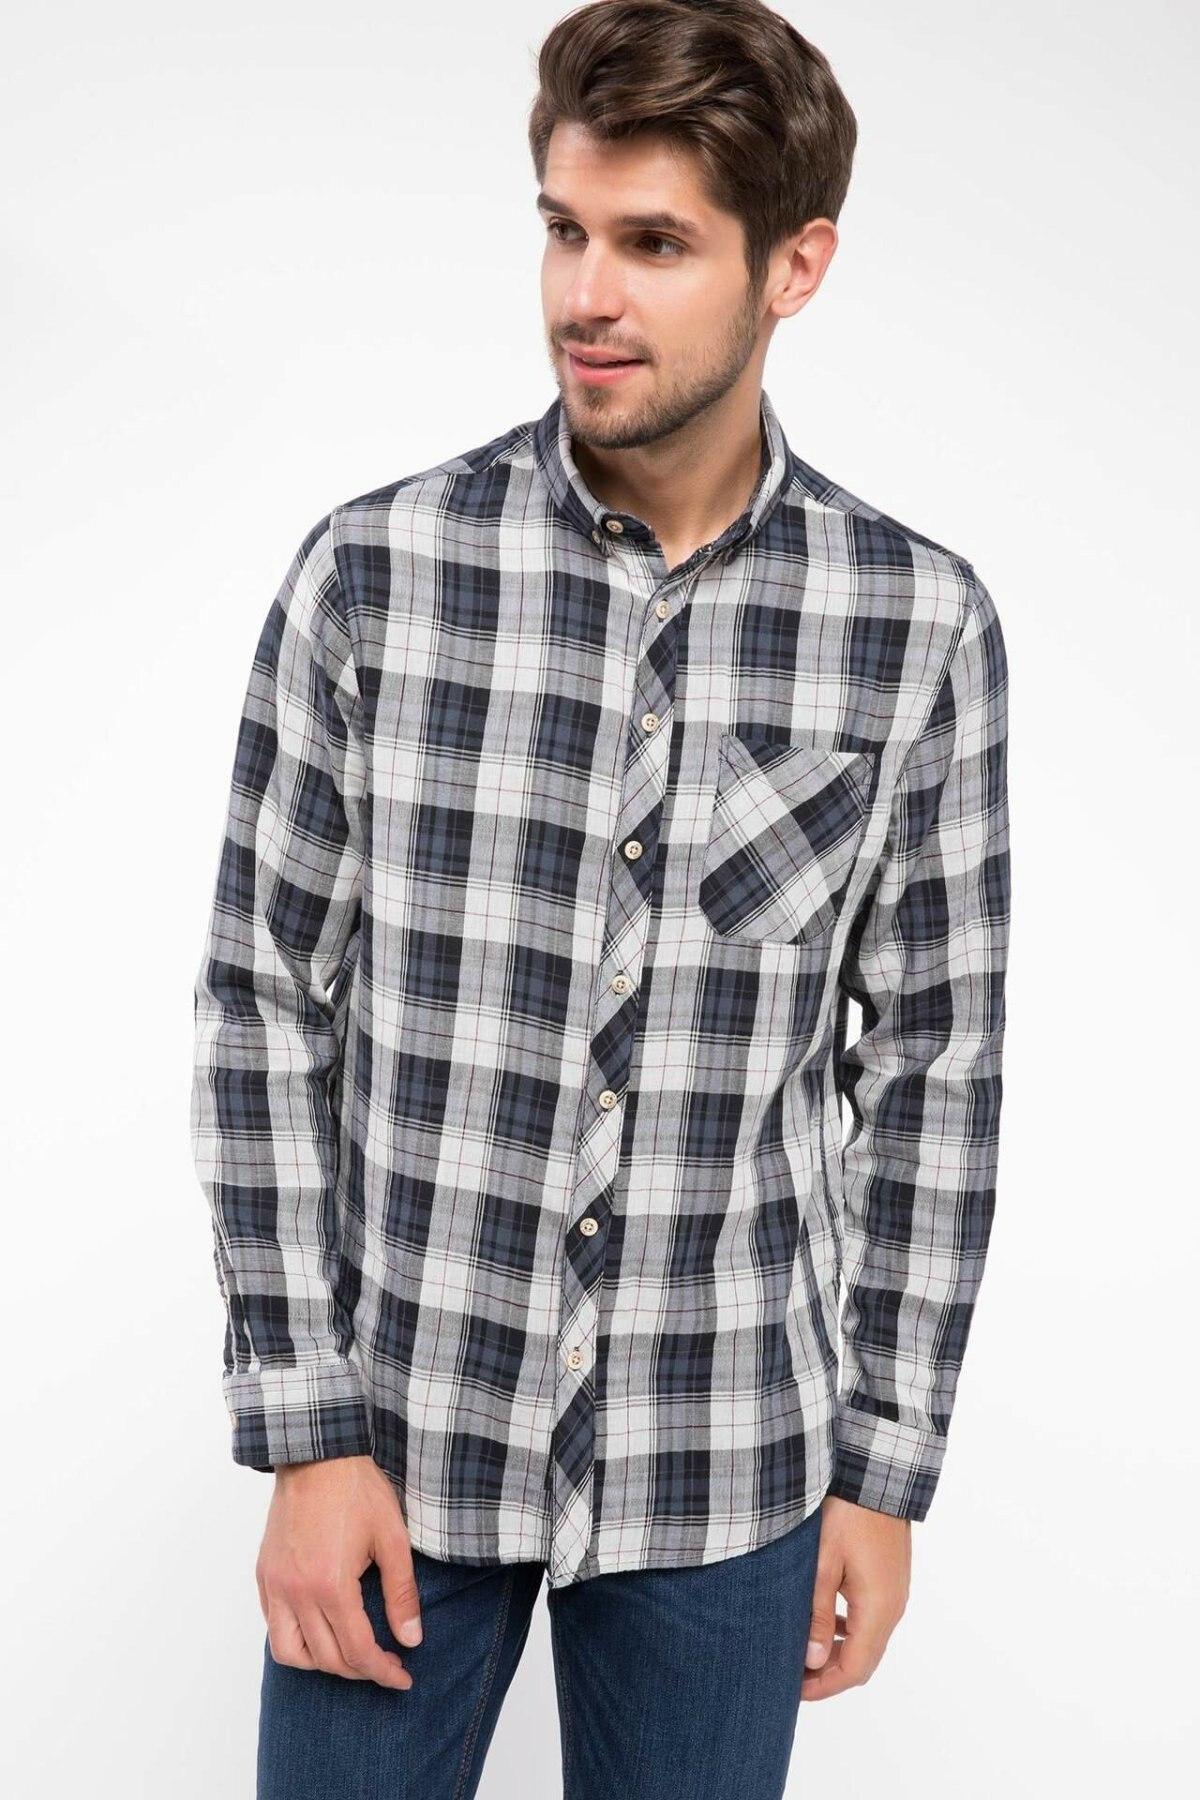 DeFacto Man Cotton Top Shirts Men Plaids Autumn Long Sleeve Shirt Male Turn-down Collar Tops Shirts Best Selling-I9203AZ18AU